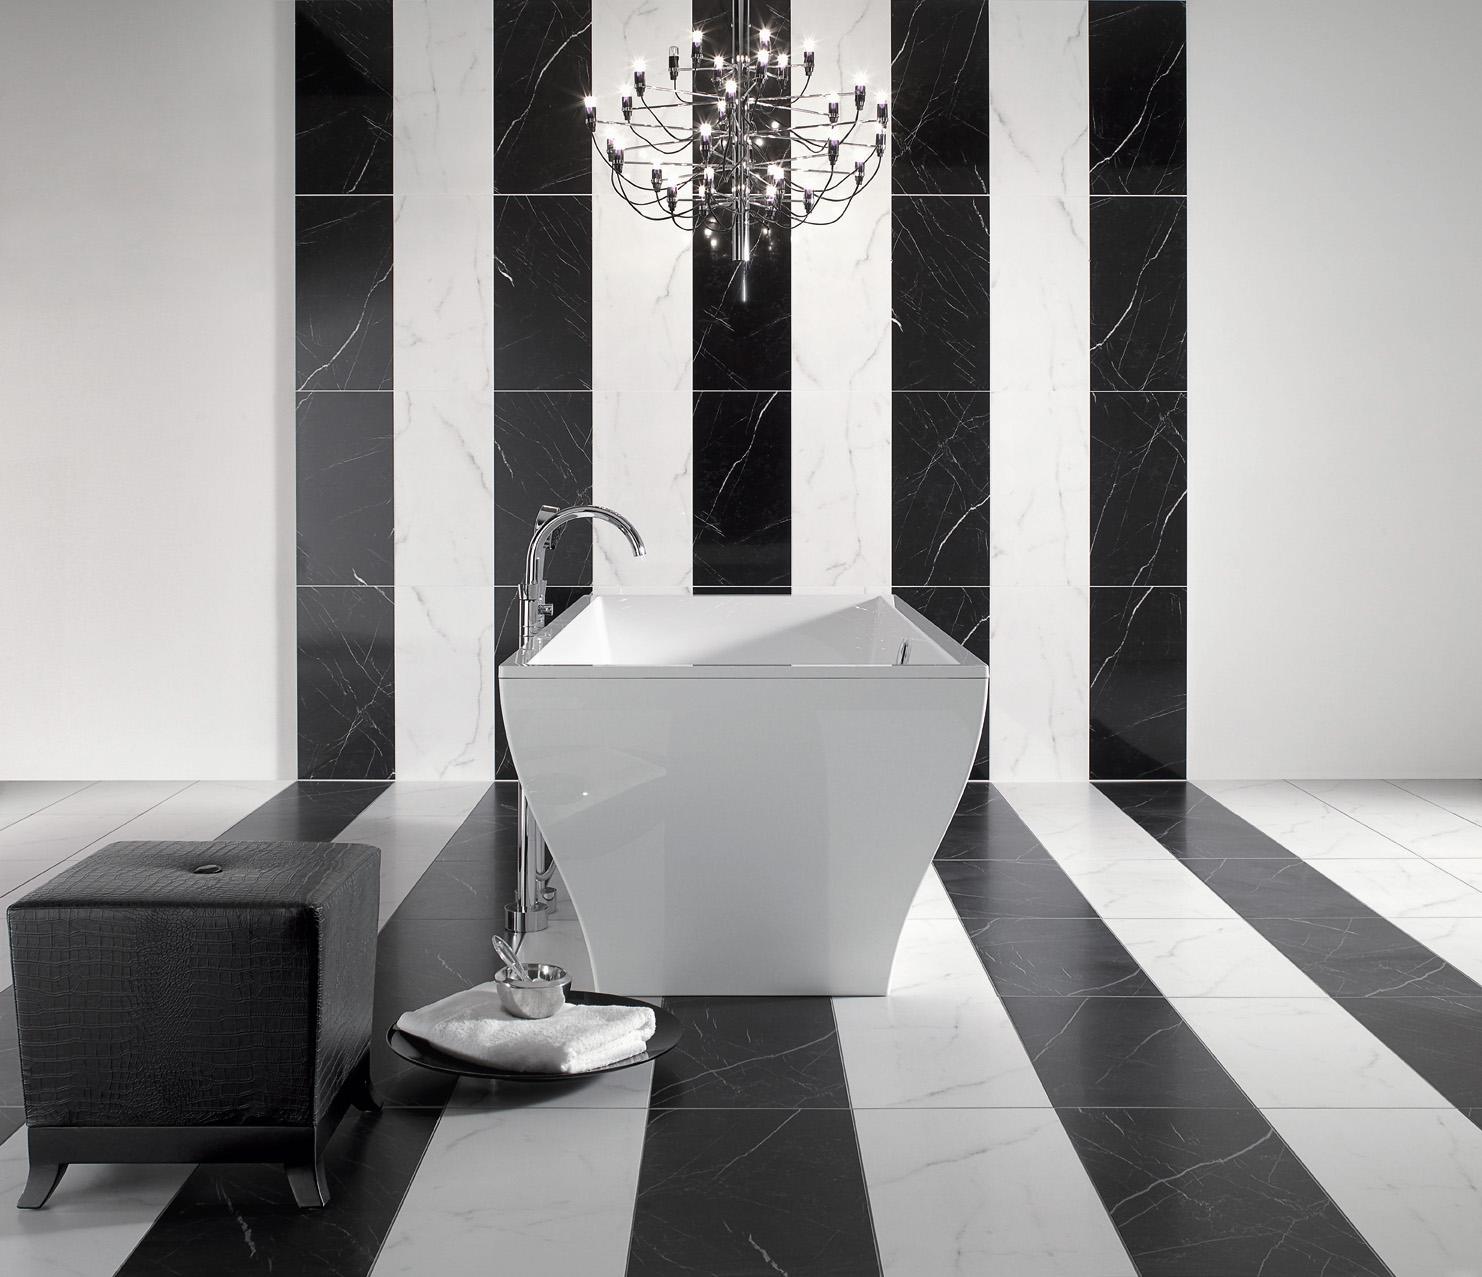 Bathroom Tiles Villeroy Boch villeroy & boch (uk) bathroom, kitchen & tiles division